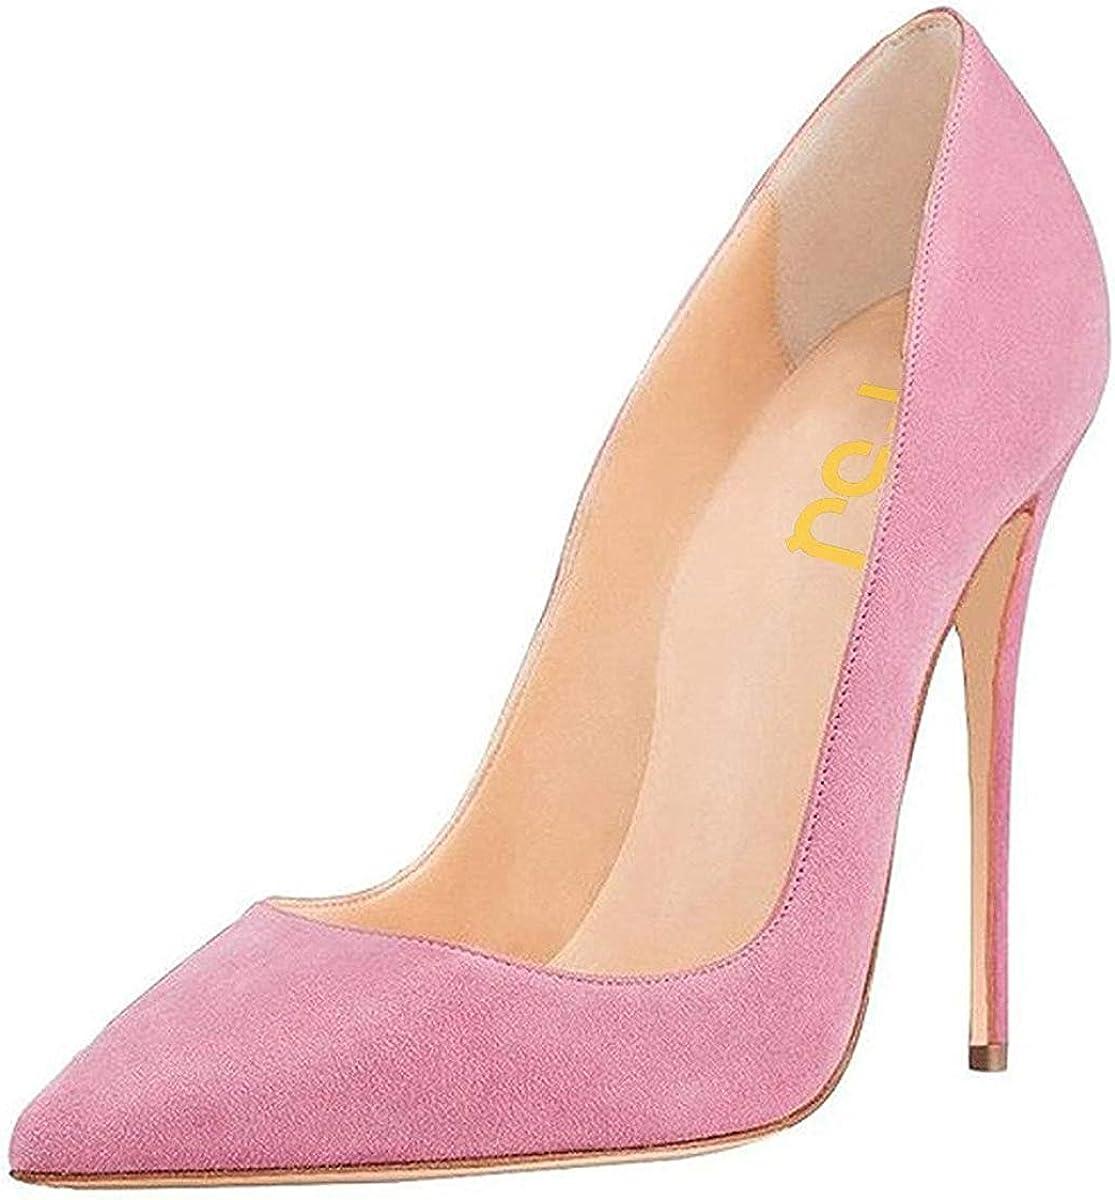 FSJ Women Sexy Financial sales Direct stock discount sale Suede Pointed Toe Pumps cm Stiletto Heels High 12